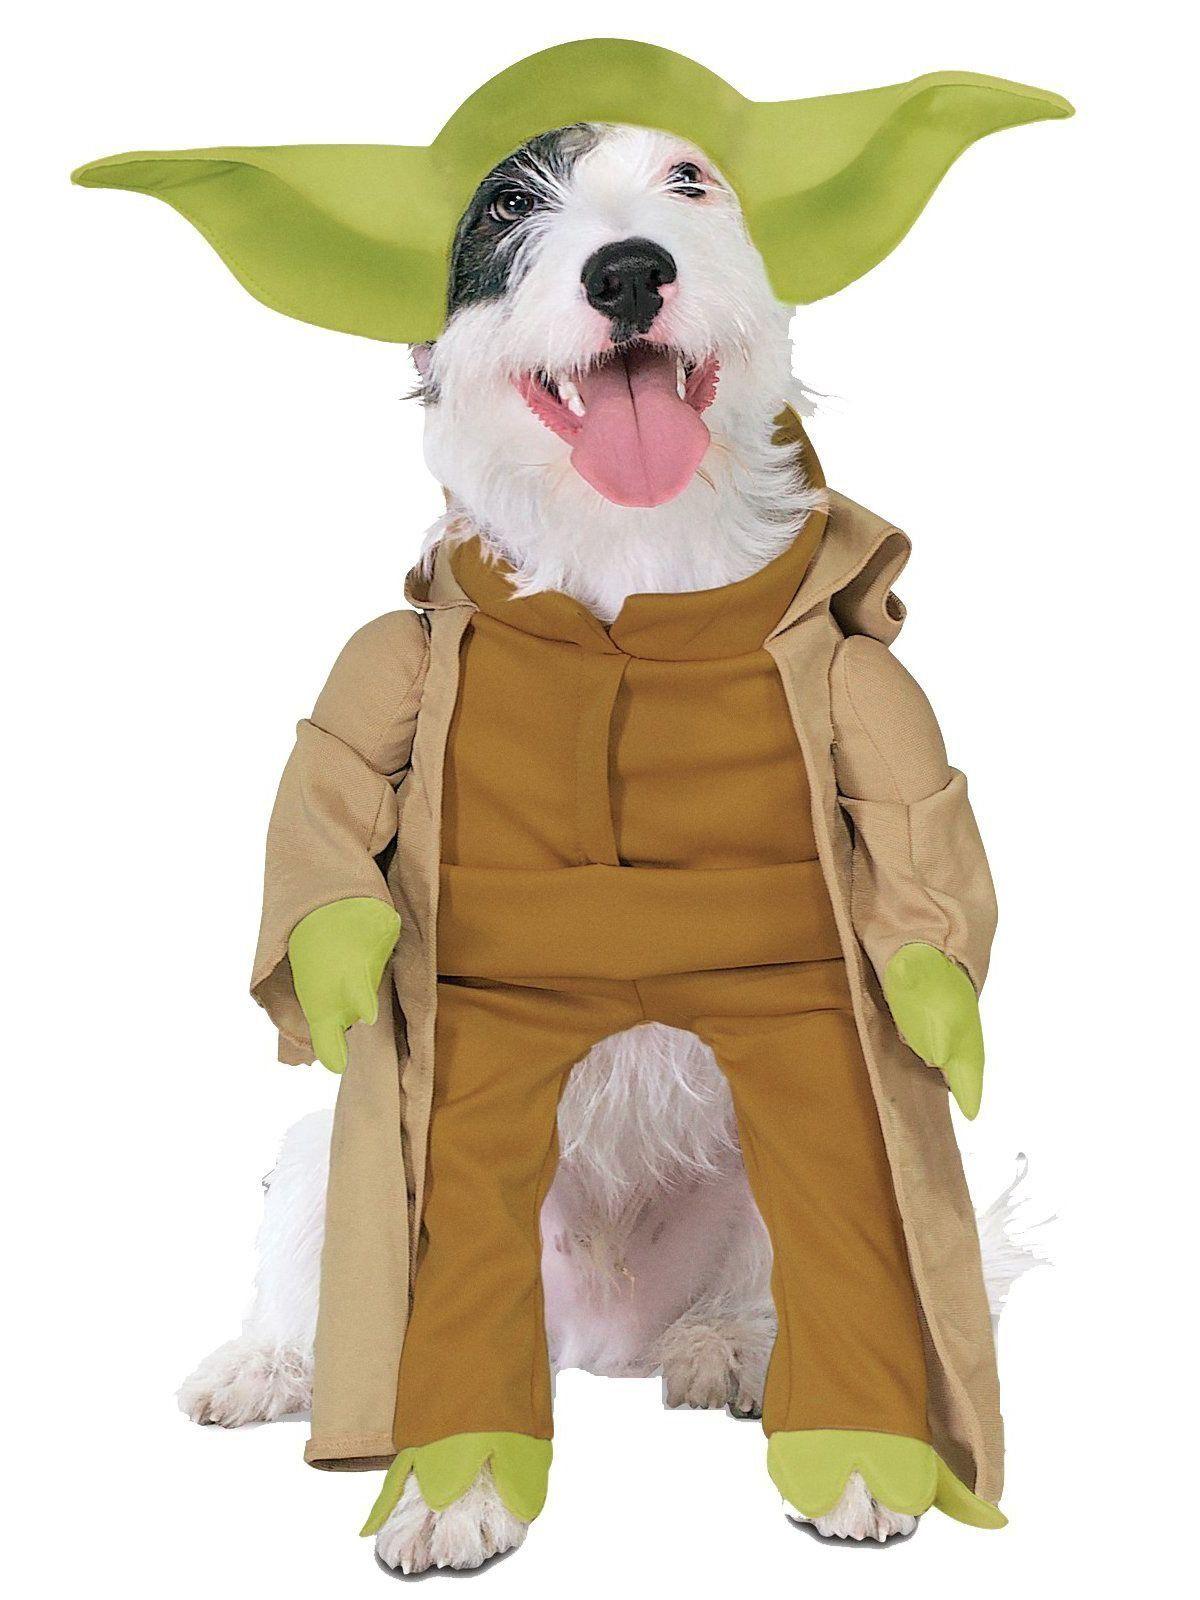 Star wars yoda pet costume large bonanzaus top costume ideas